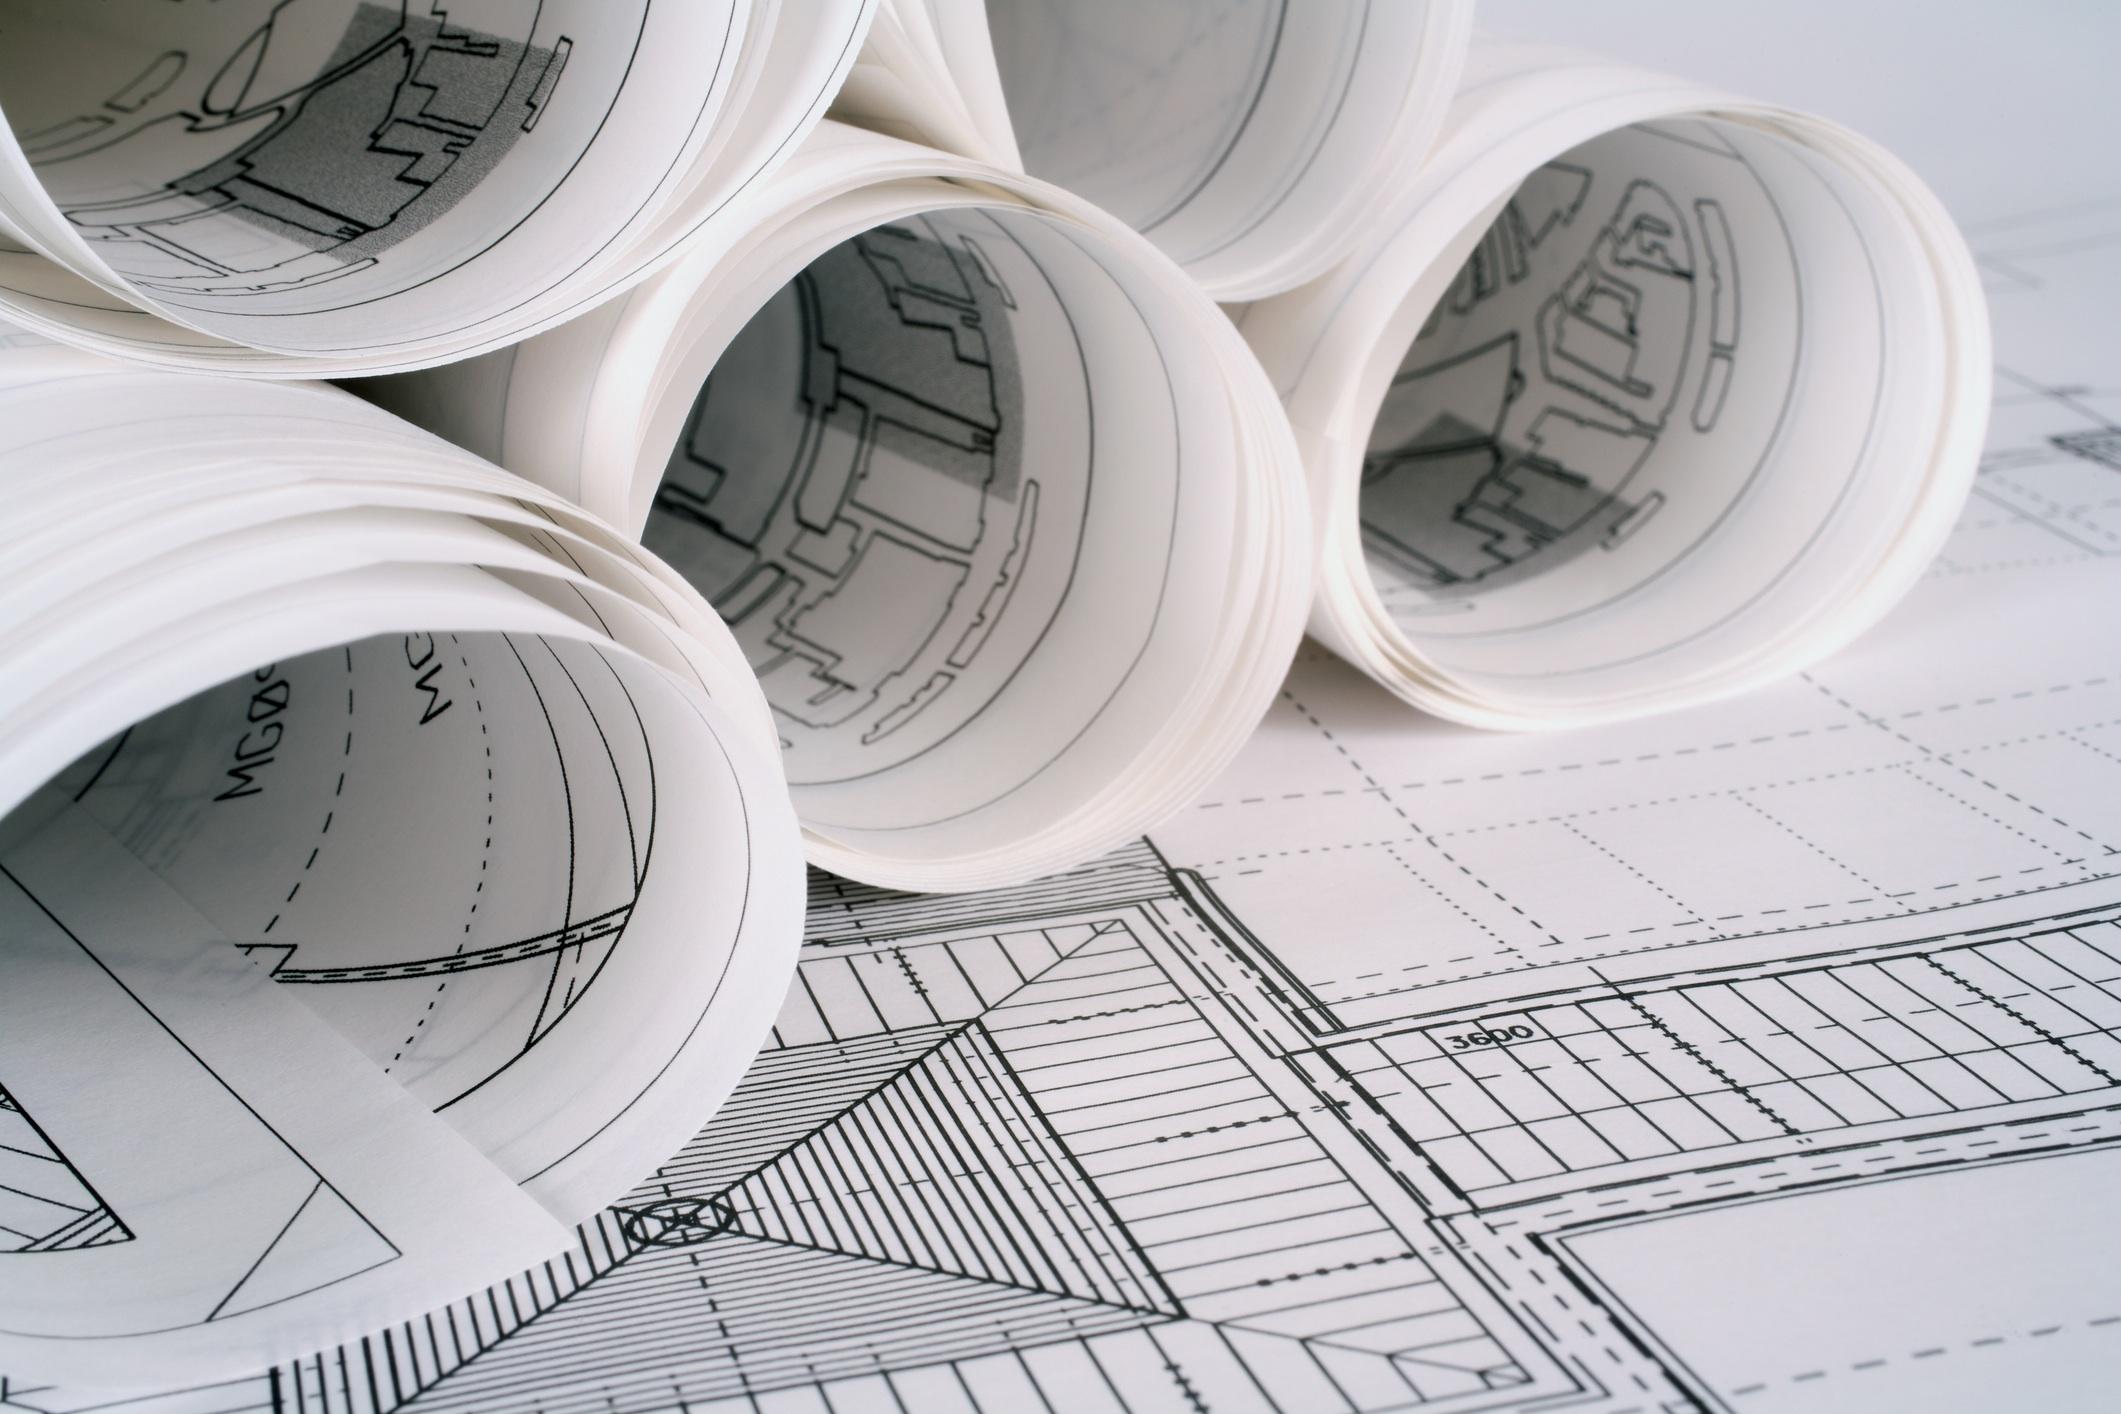 8589130429613-architecture-plans-wallpaper-hd.jpg